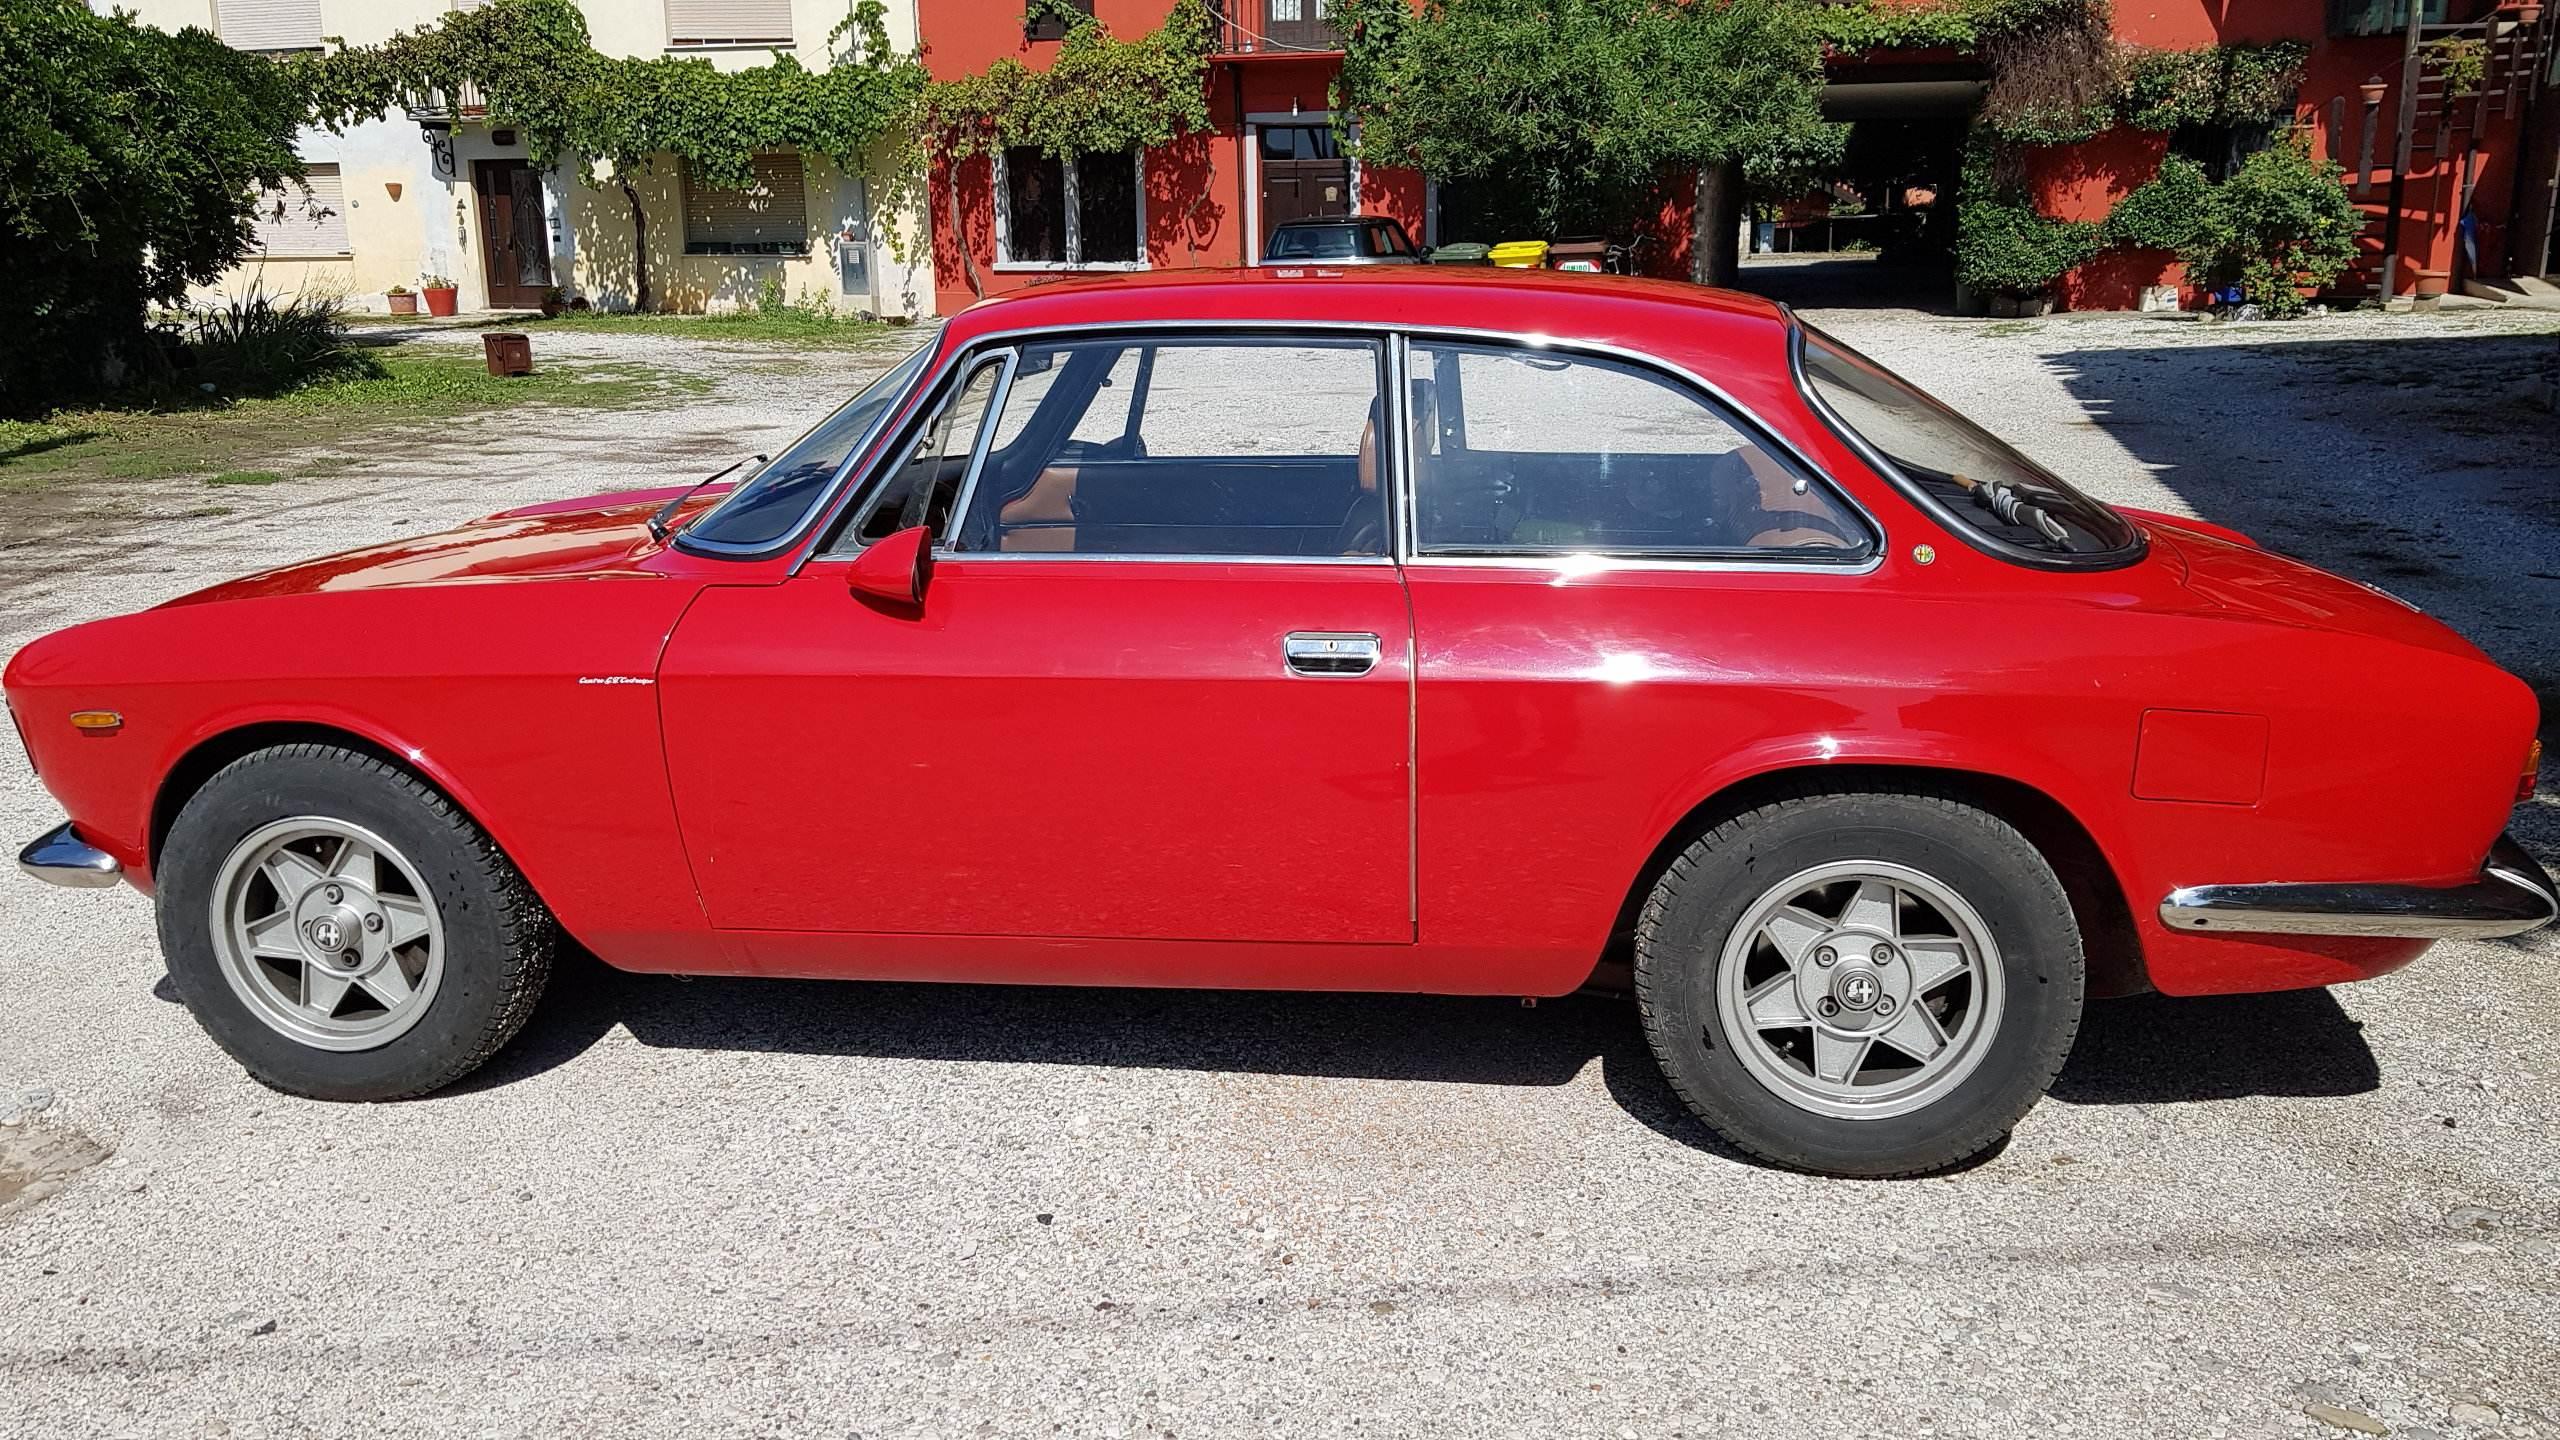 foto GT Junior 1300 scalino (1968) - 4